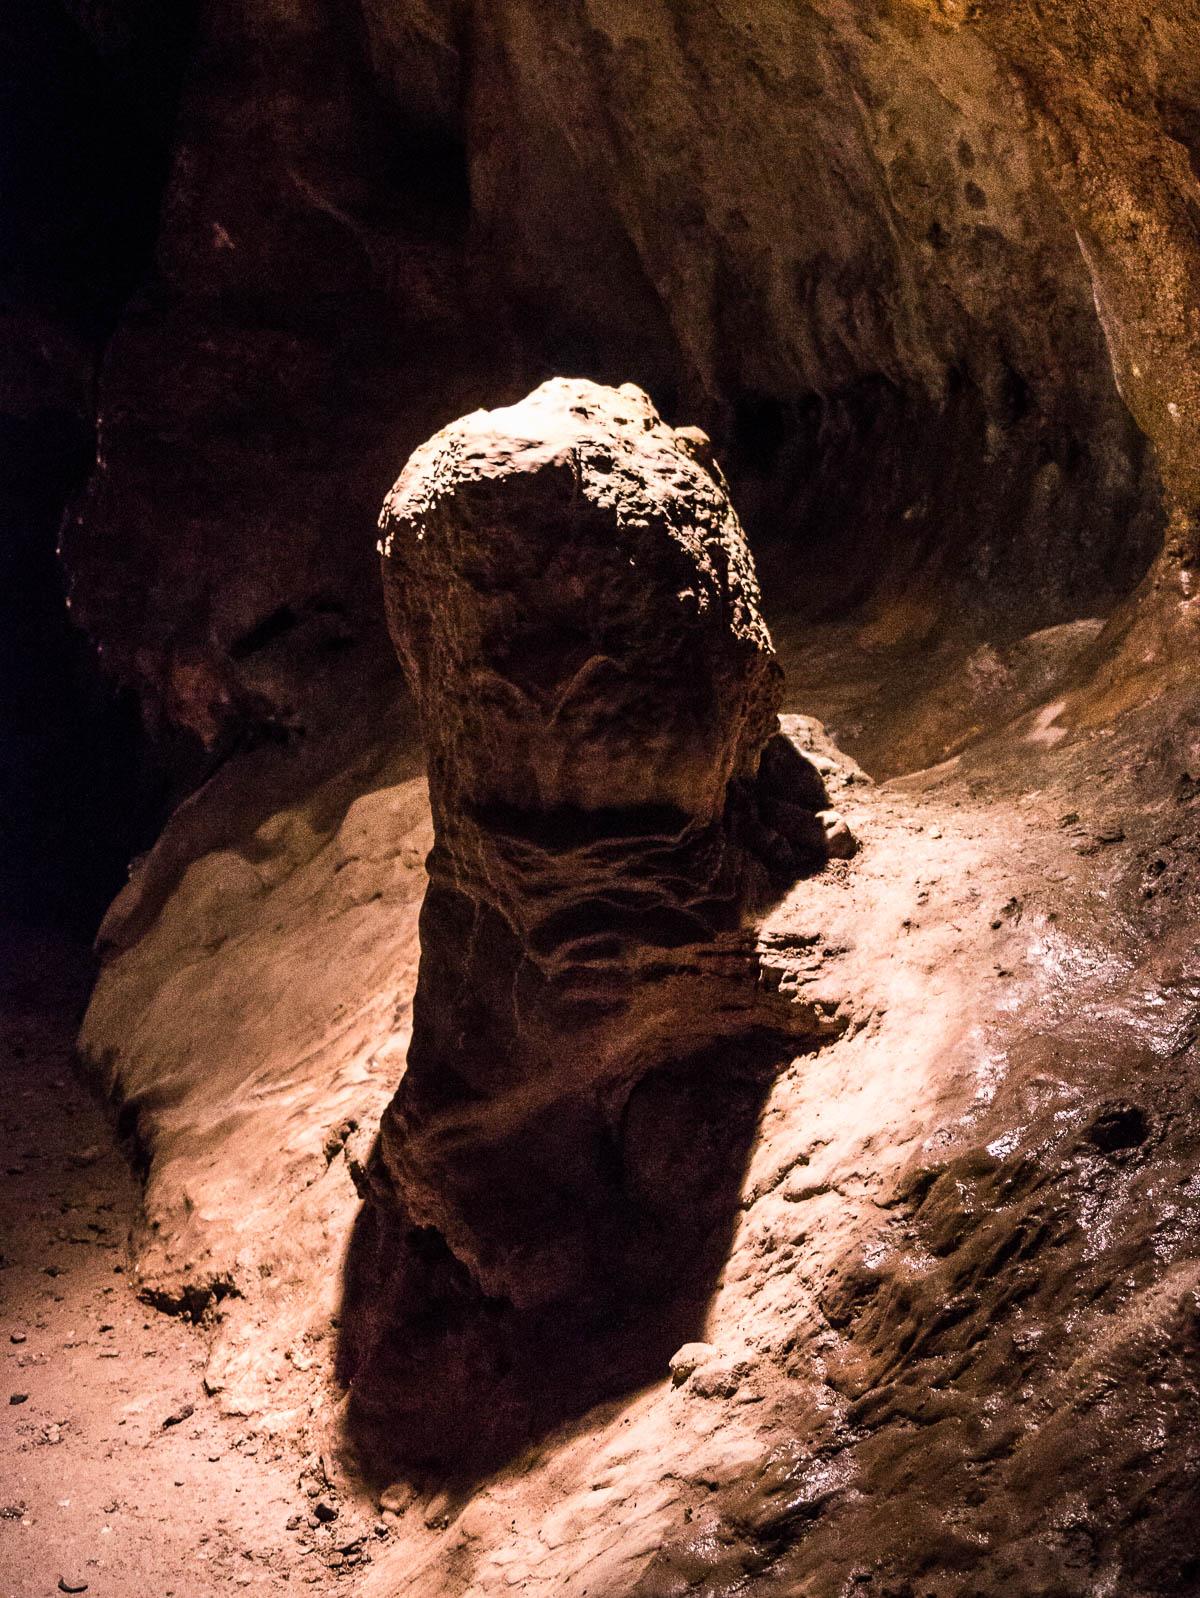 roche calcaire grottes margot saulges bis